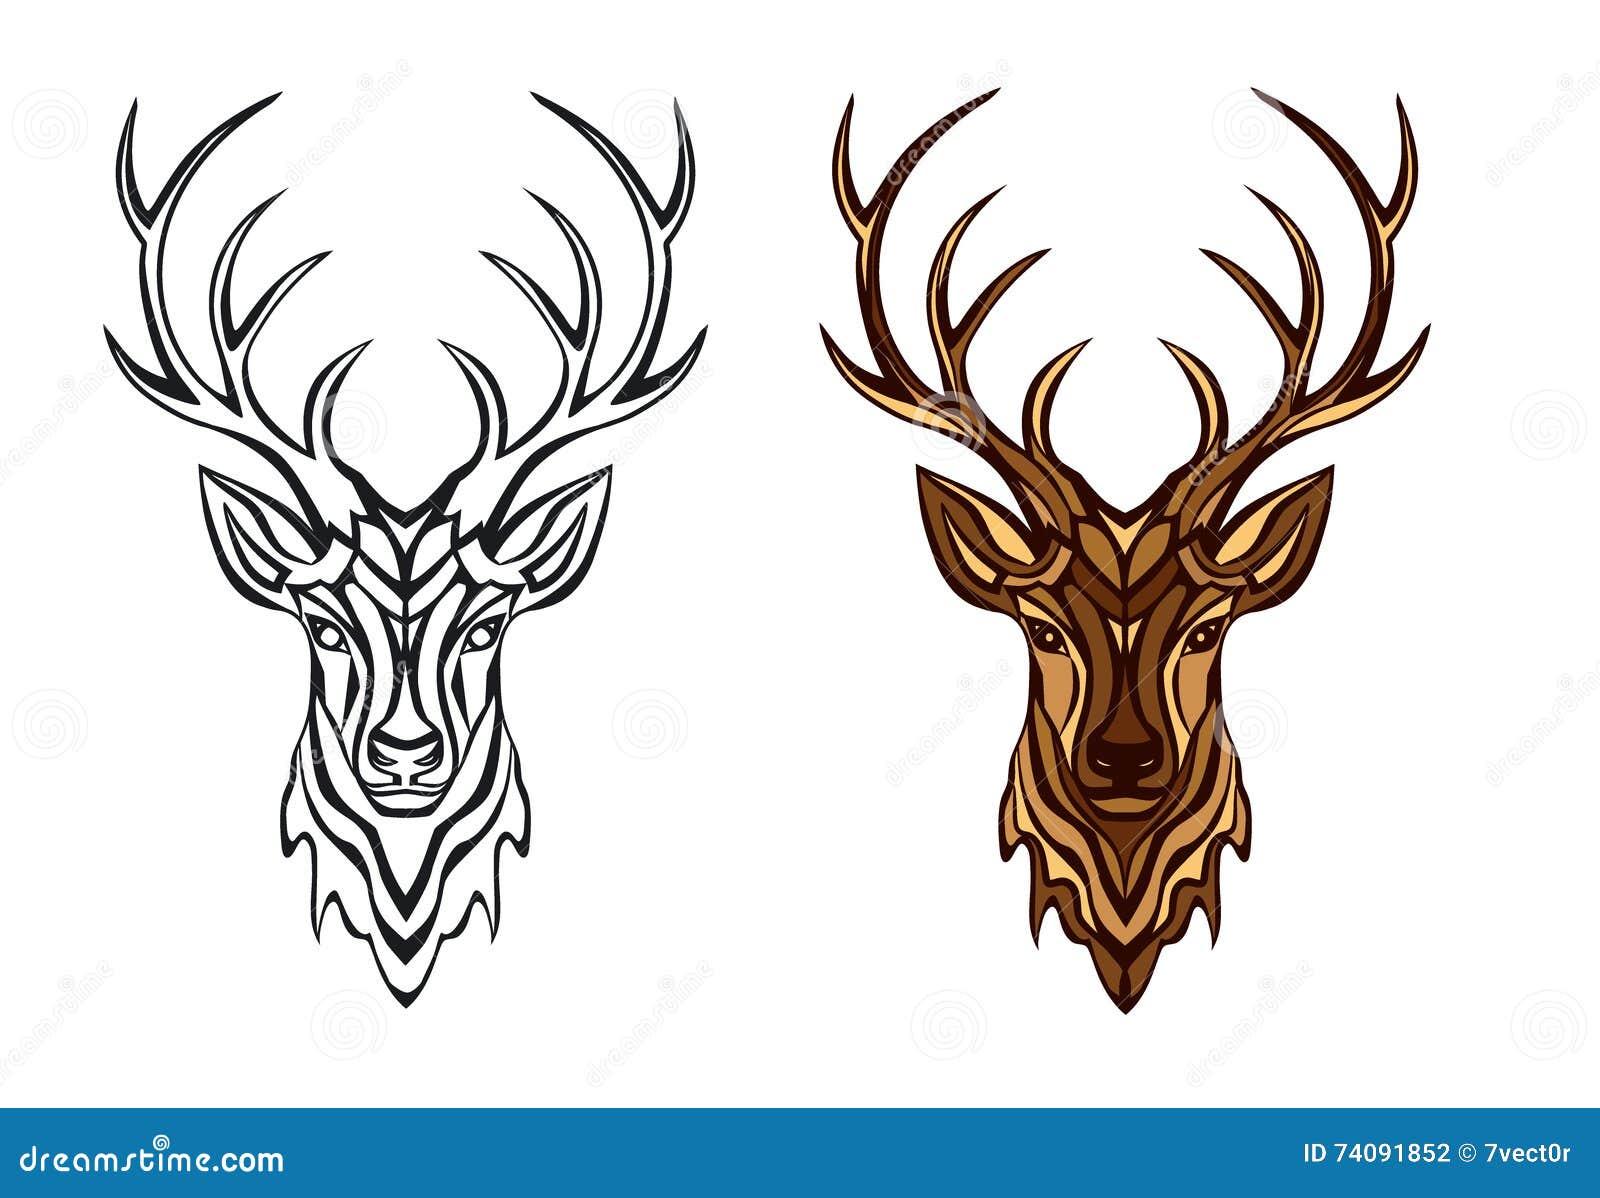 Stylized Deer Head Vector Illustration Stock Vector ...